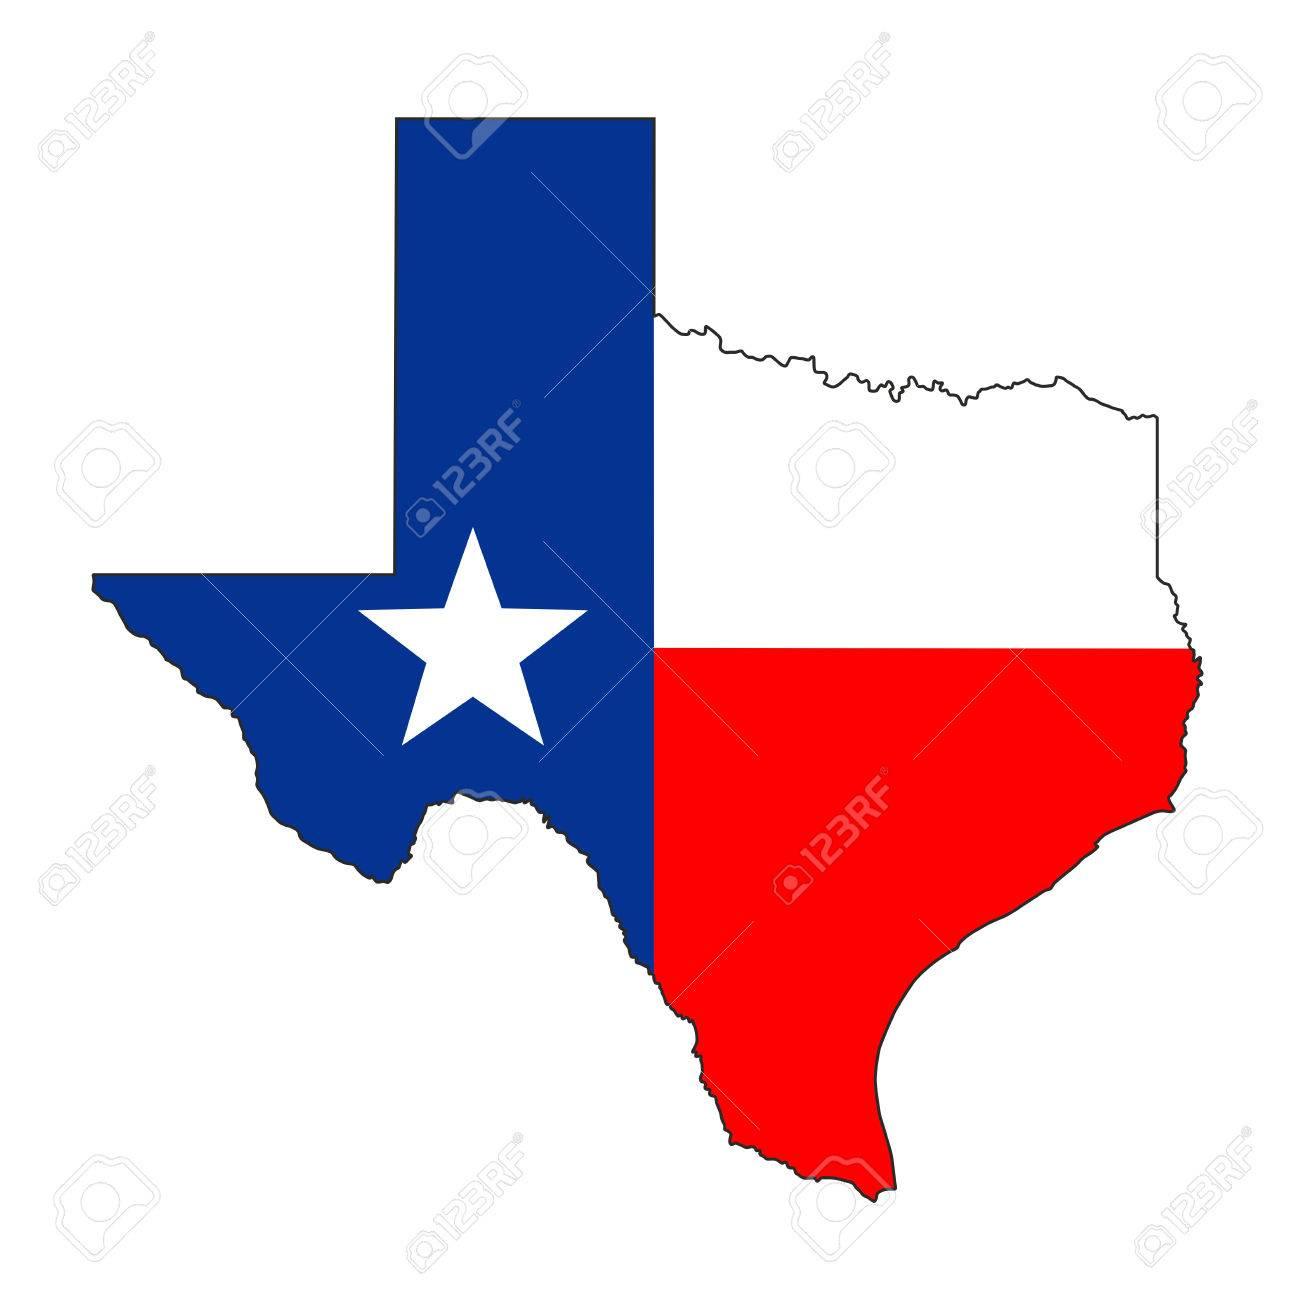 Texas State Usa National Flag Map Shape Illustration Stock Photo - Texas Flag Map